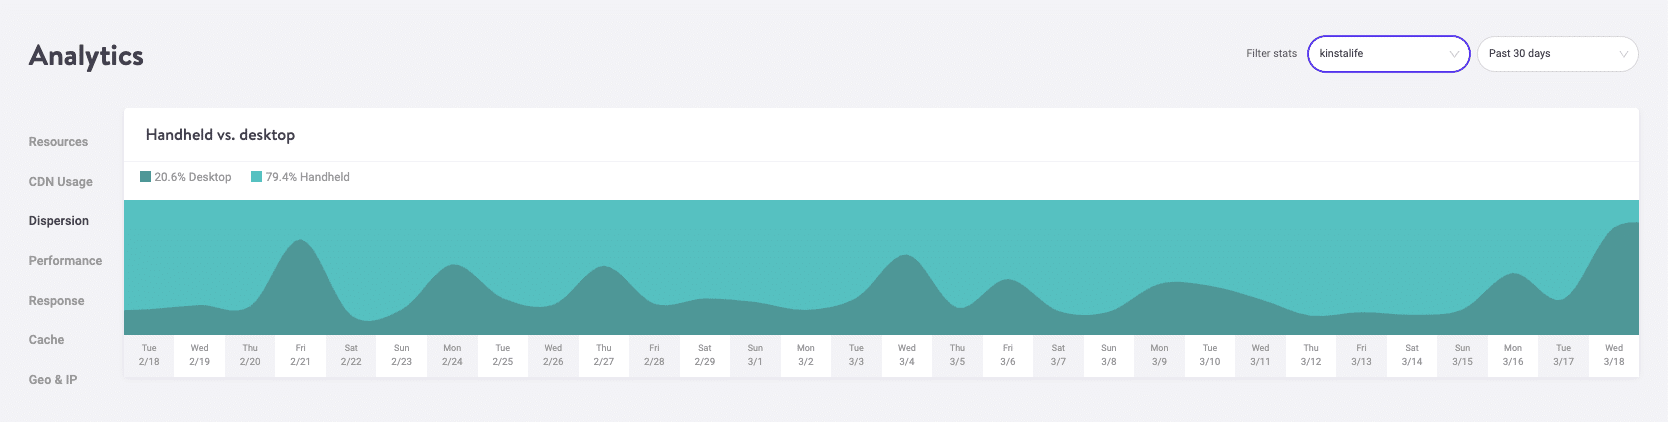 MyKinsta Analytics mobil vs dator-trafik